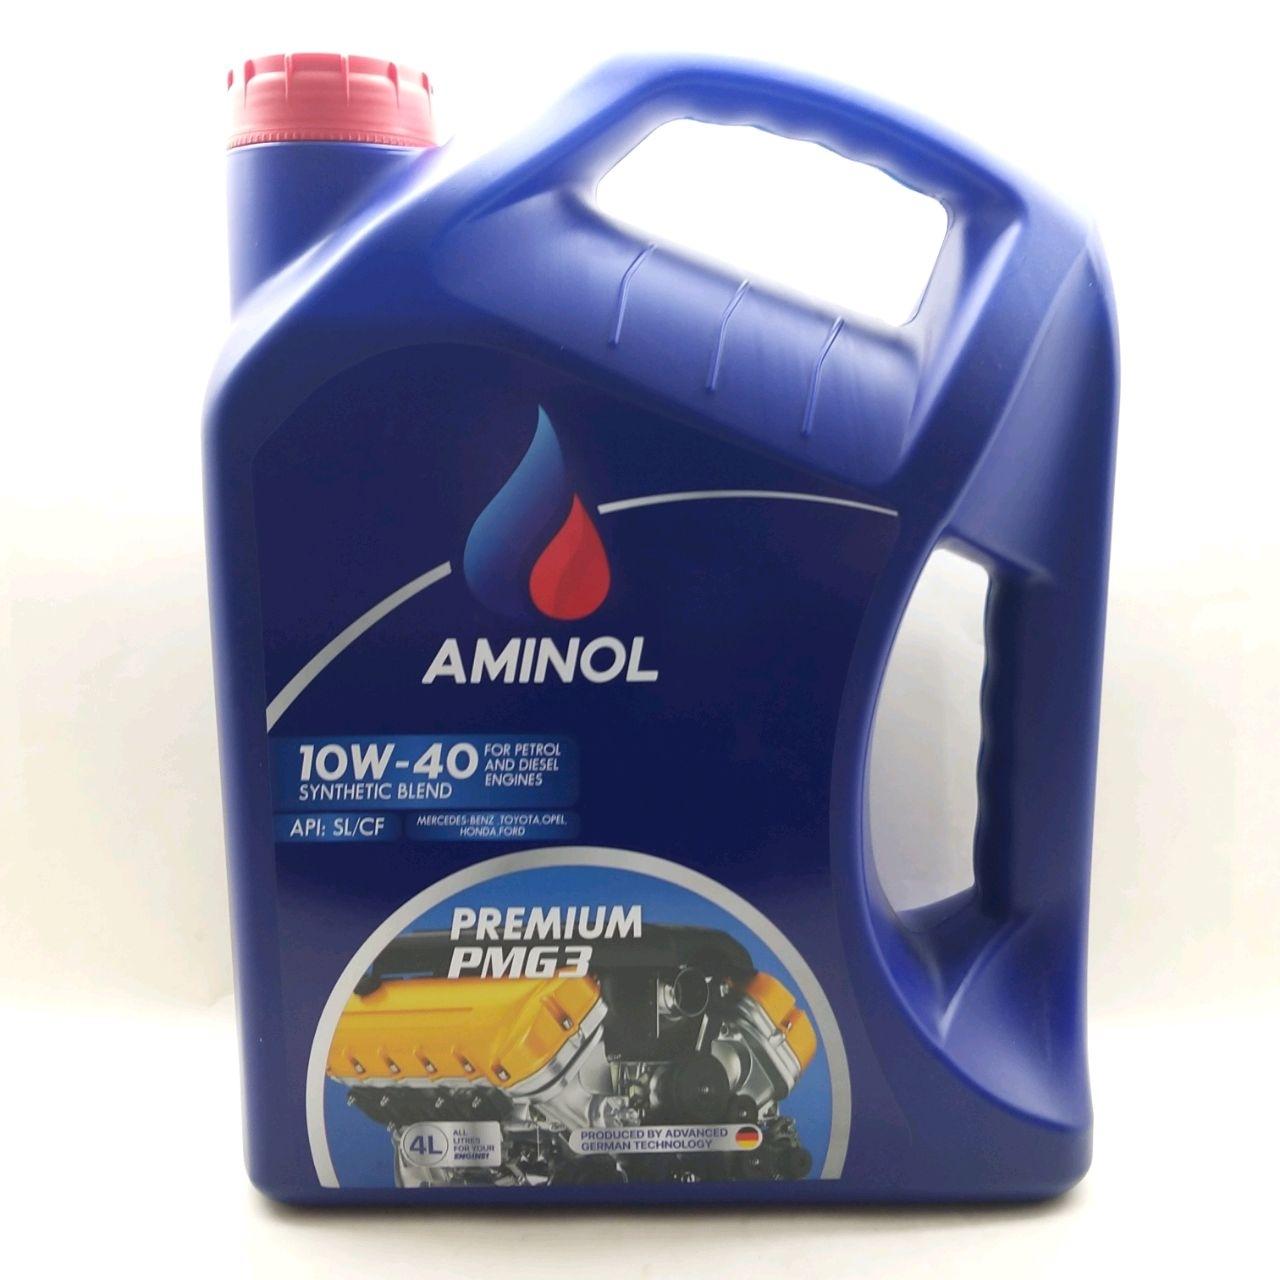 Aminol PREMIUM PMG3 10w-40 (SL/CF) 4л.